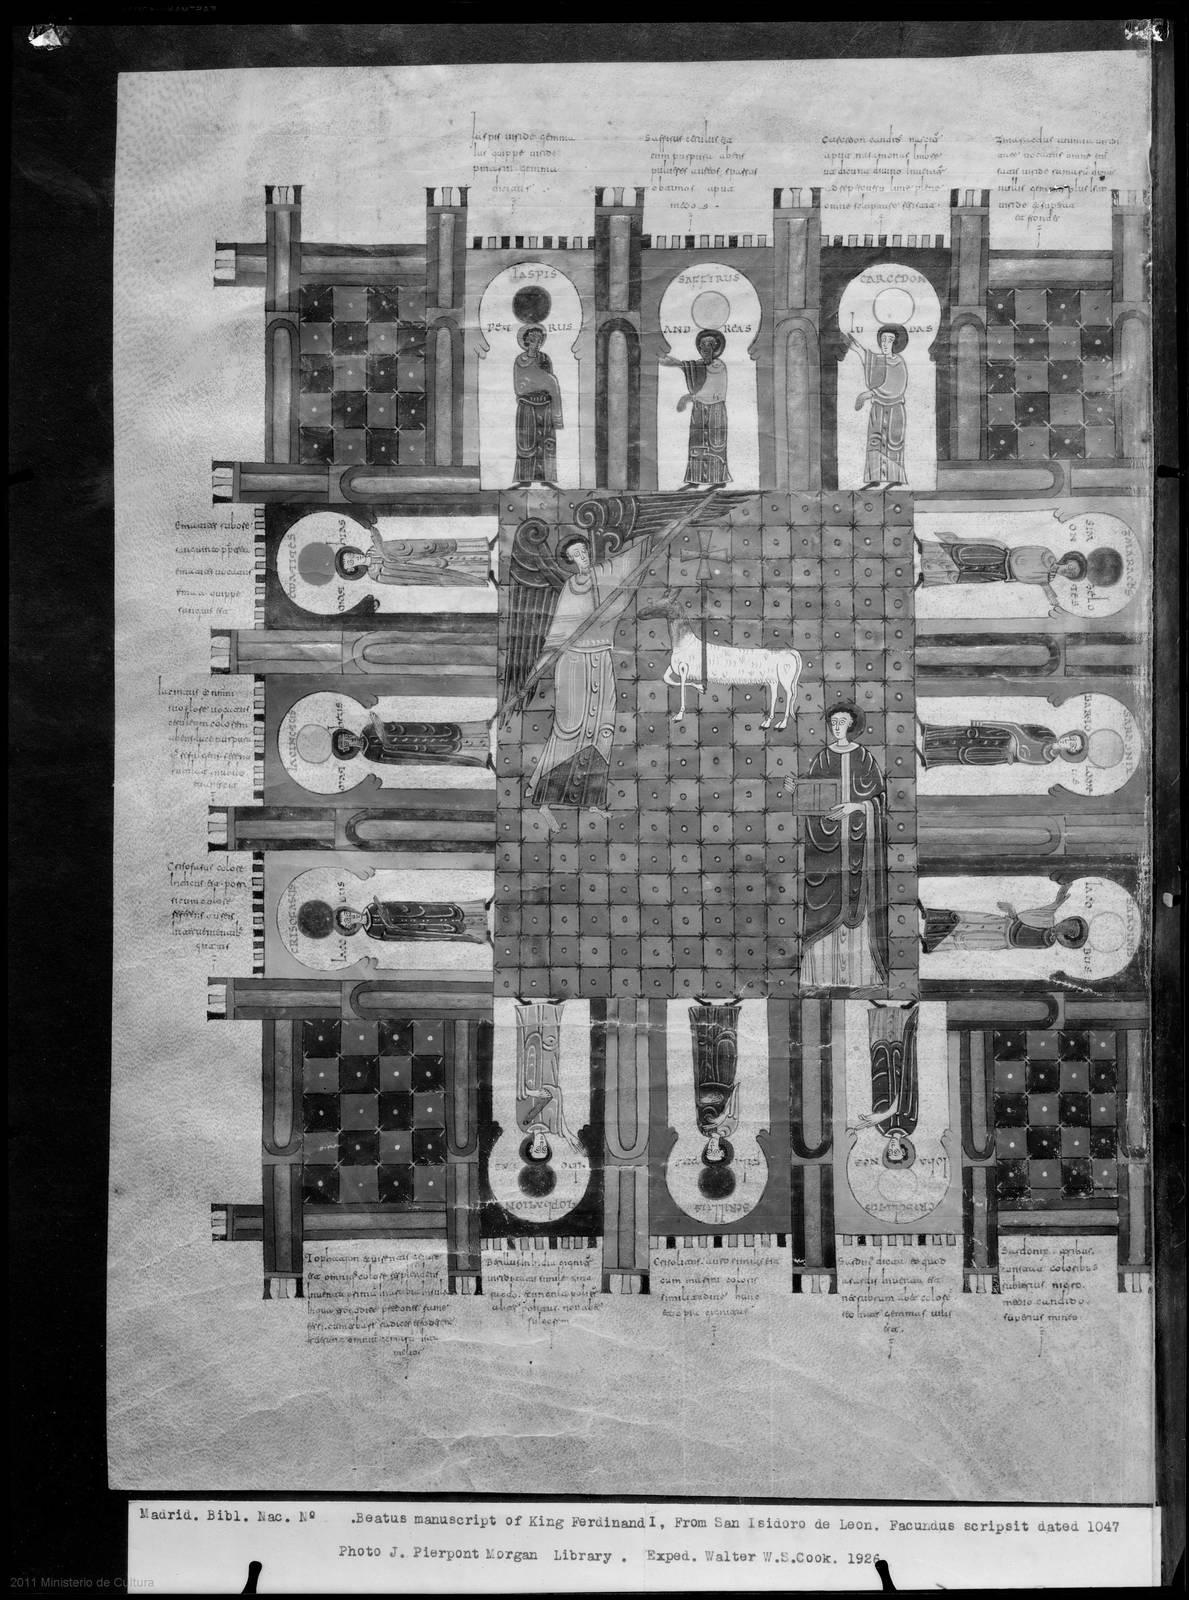 [MADRID. BIBL. NAC. Nº . BEATUS MANUSCRIPT OF KING FERDINAND I, FROM SAN ISIDORO DE LEON. FACUNDUS SCRIPSIT DATED 1047.] [Material gráfico]